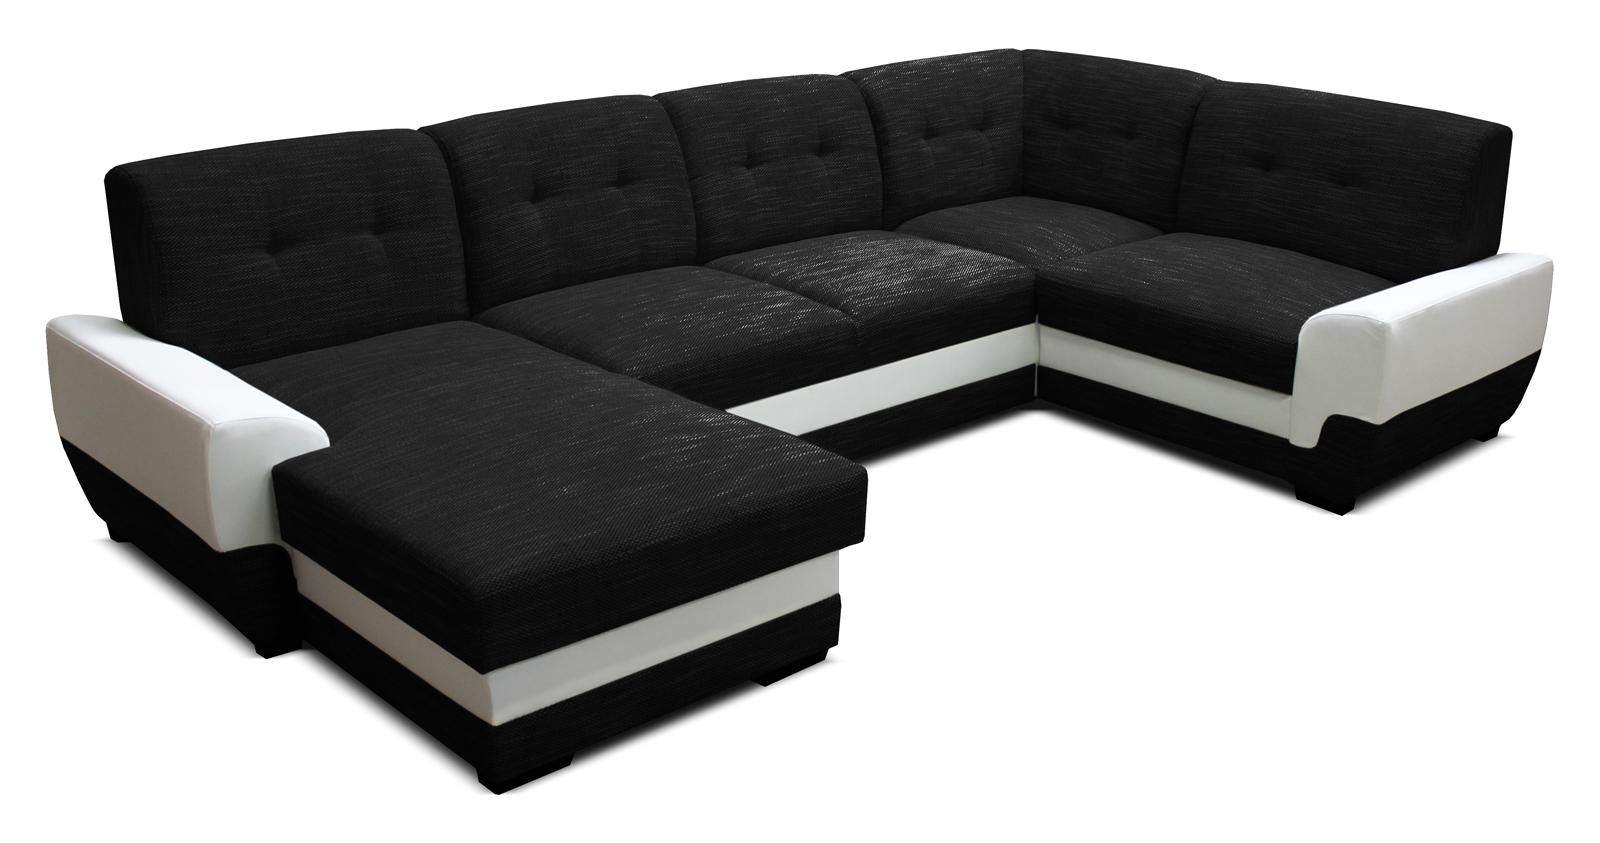 Rohová sedací souprava U - Po-Sed - Simona L+2+A+1 (černá + bílá) (L)